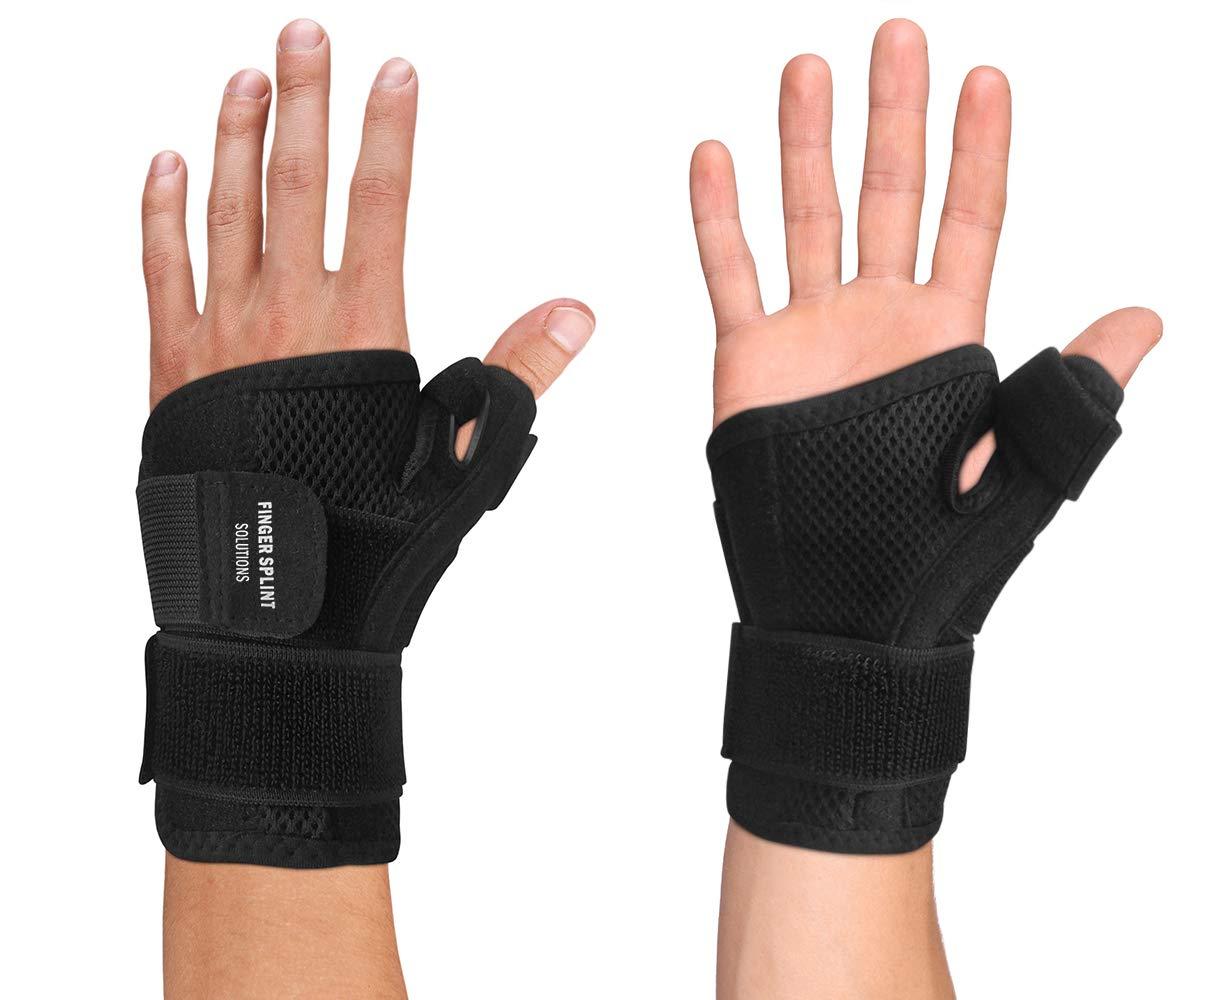 Thumb Brace Tendonitis Stabilizer Immobilizer